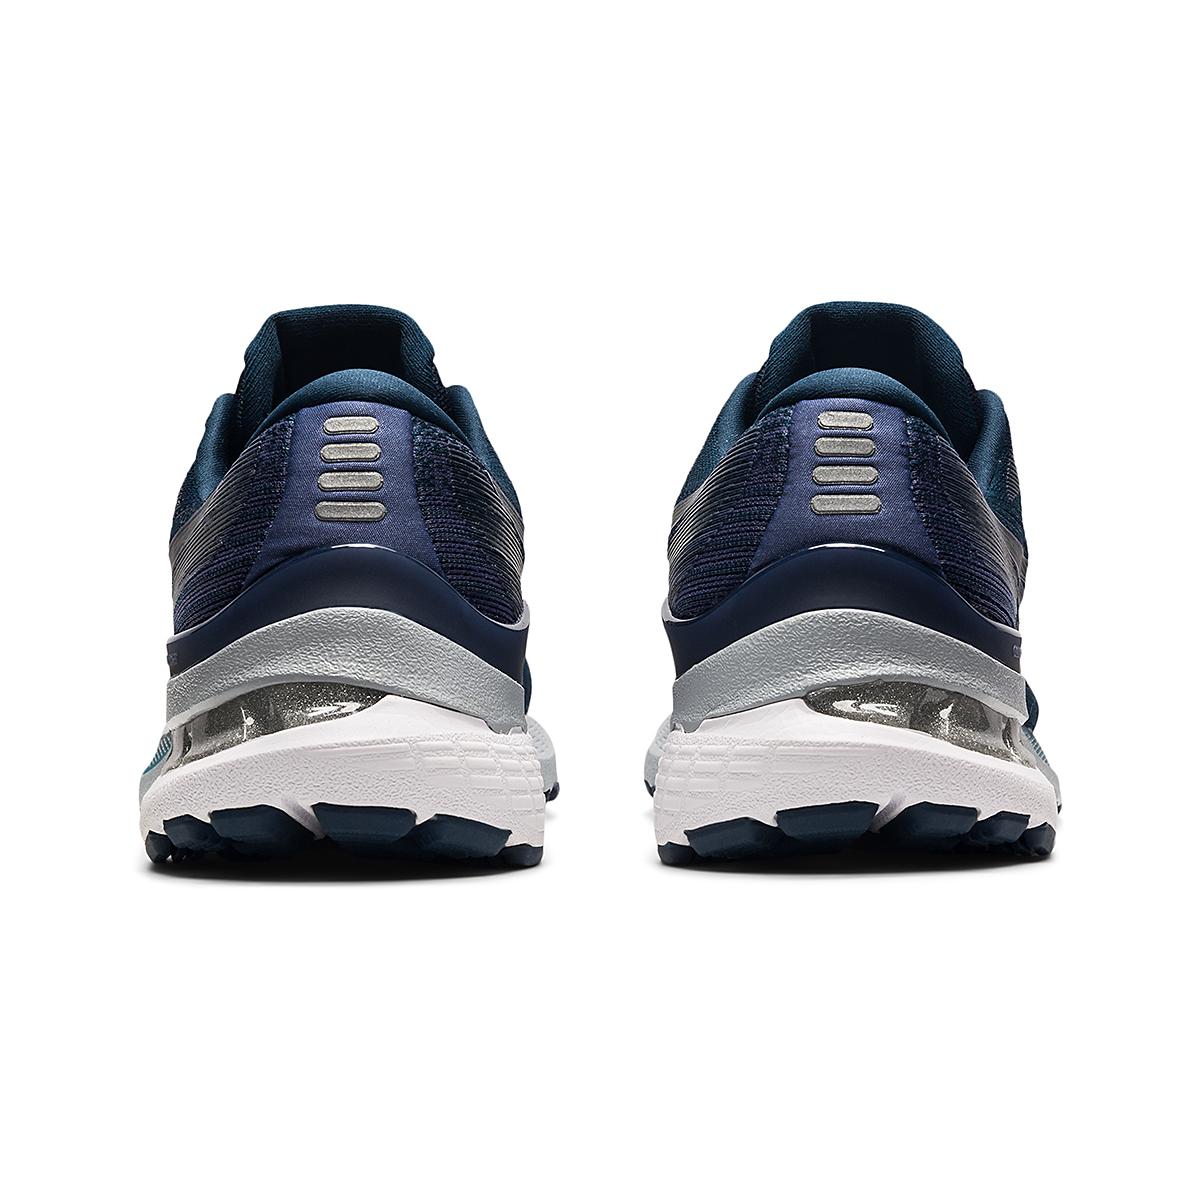 Women's Asics Gel-Kayano 28 Running Shoe - Color: French Blue/Thunder Blue - Size: 5 - Width: Wide, French Blue/Thunder Blue, large, image 6